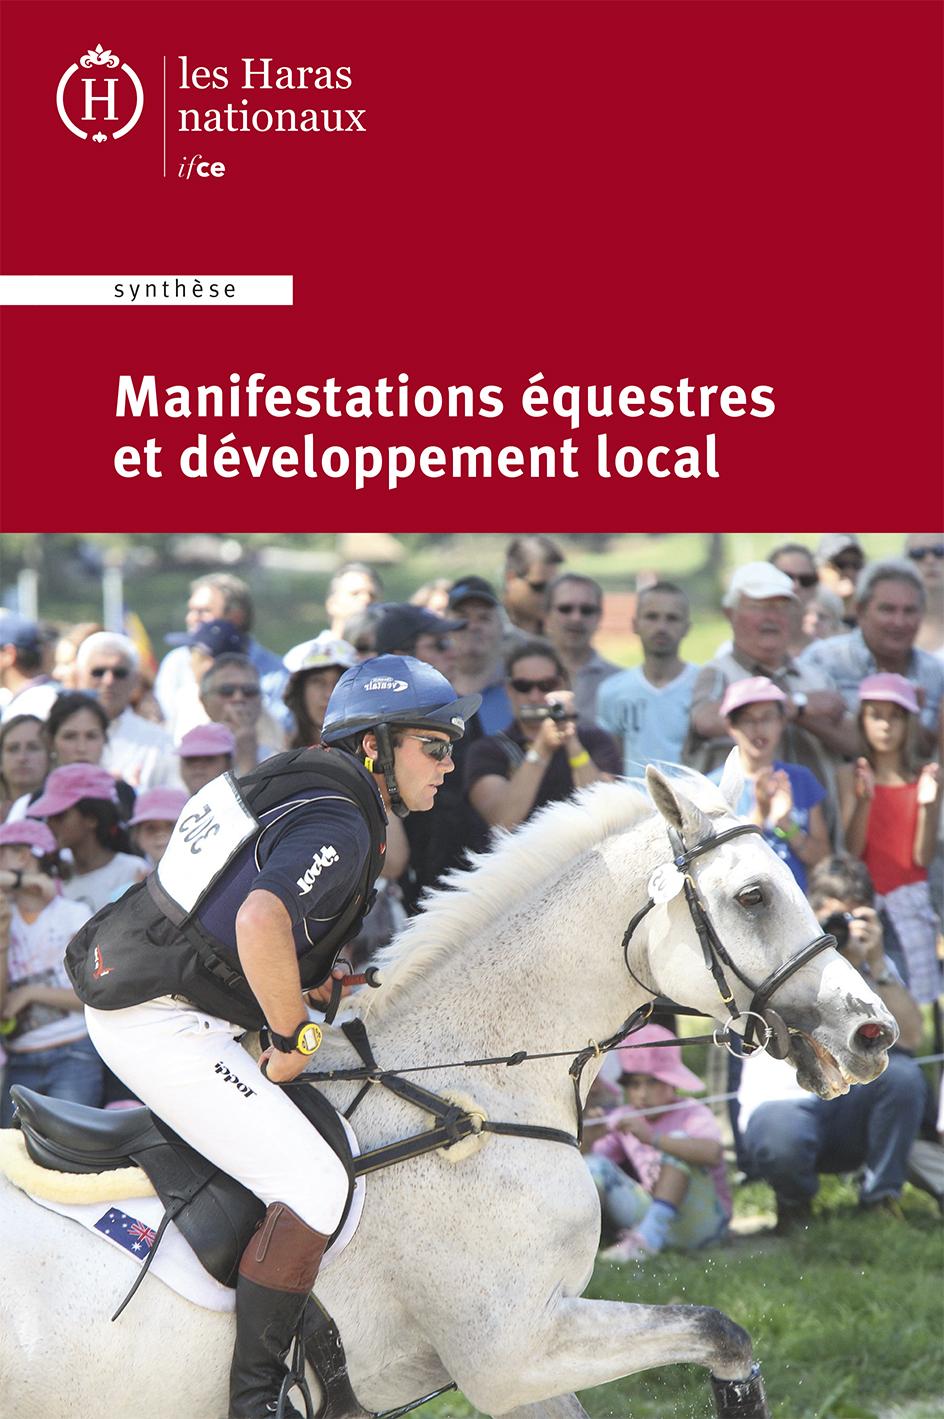 DIF Manifestations equestres plat1